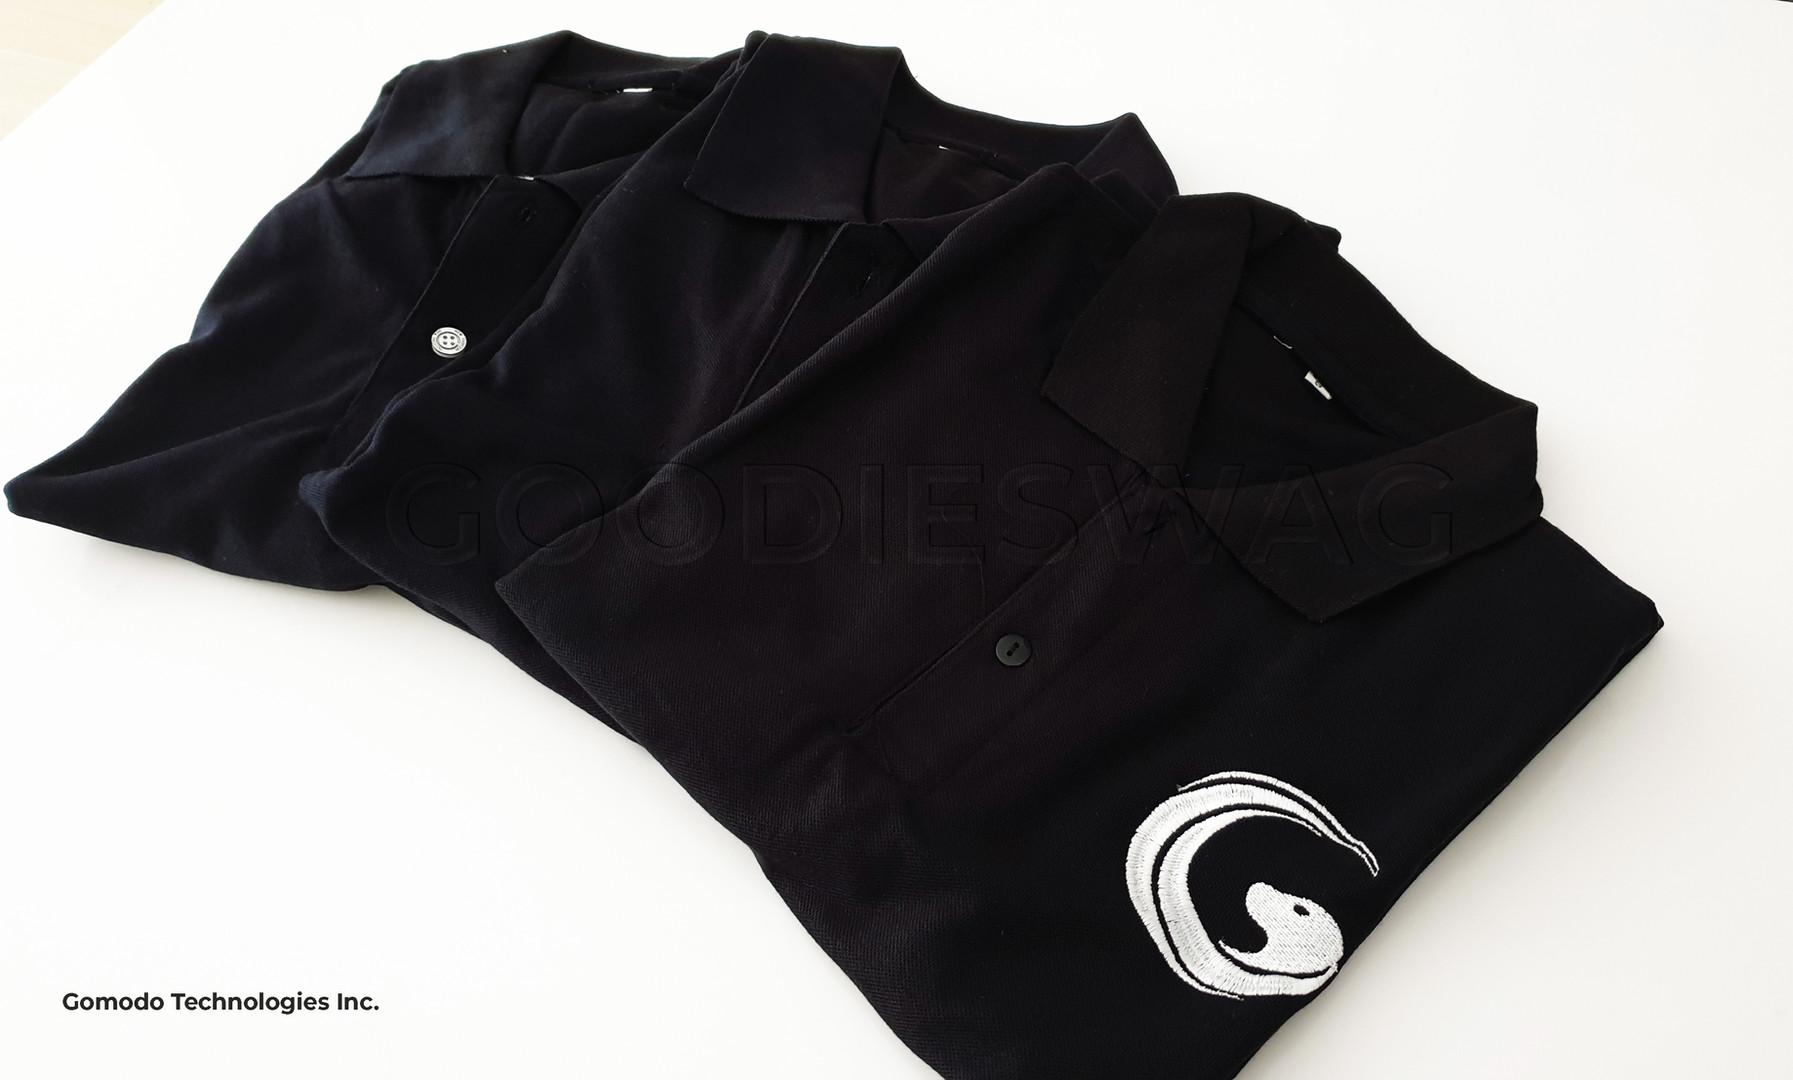 Gomodo Technologies Custom Poloshirt Jakarta Indonesia Souvenir Promosi